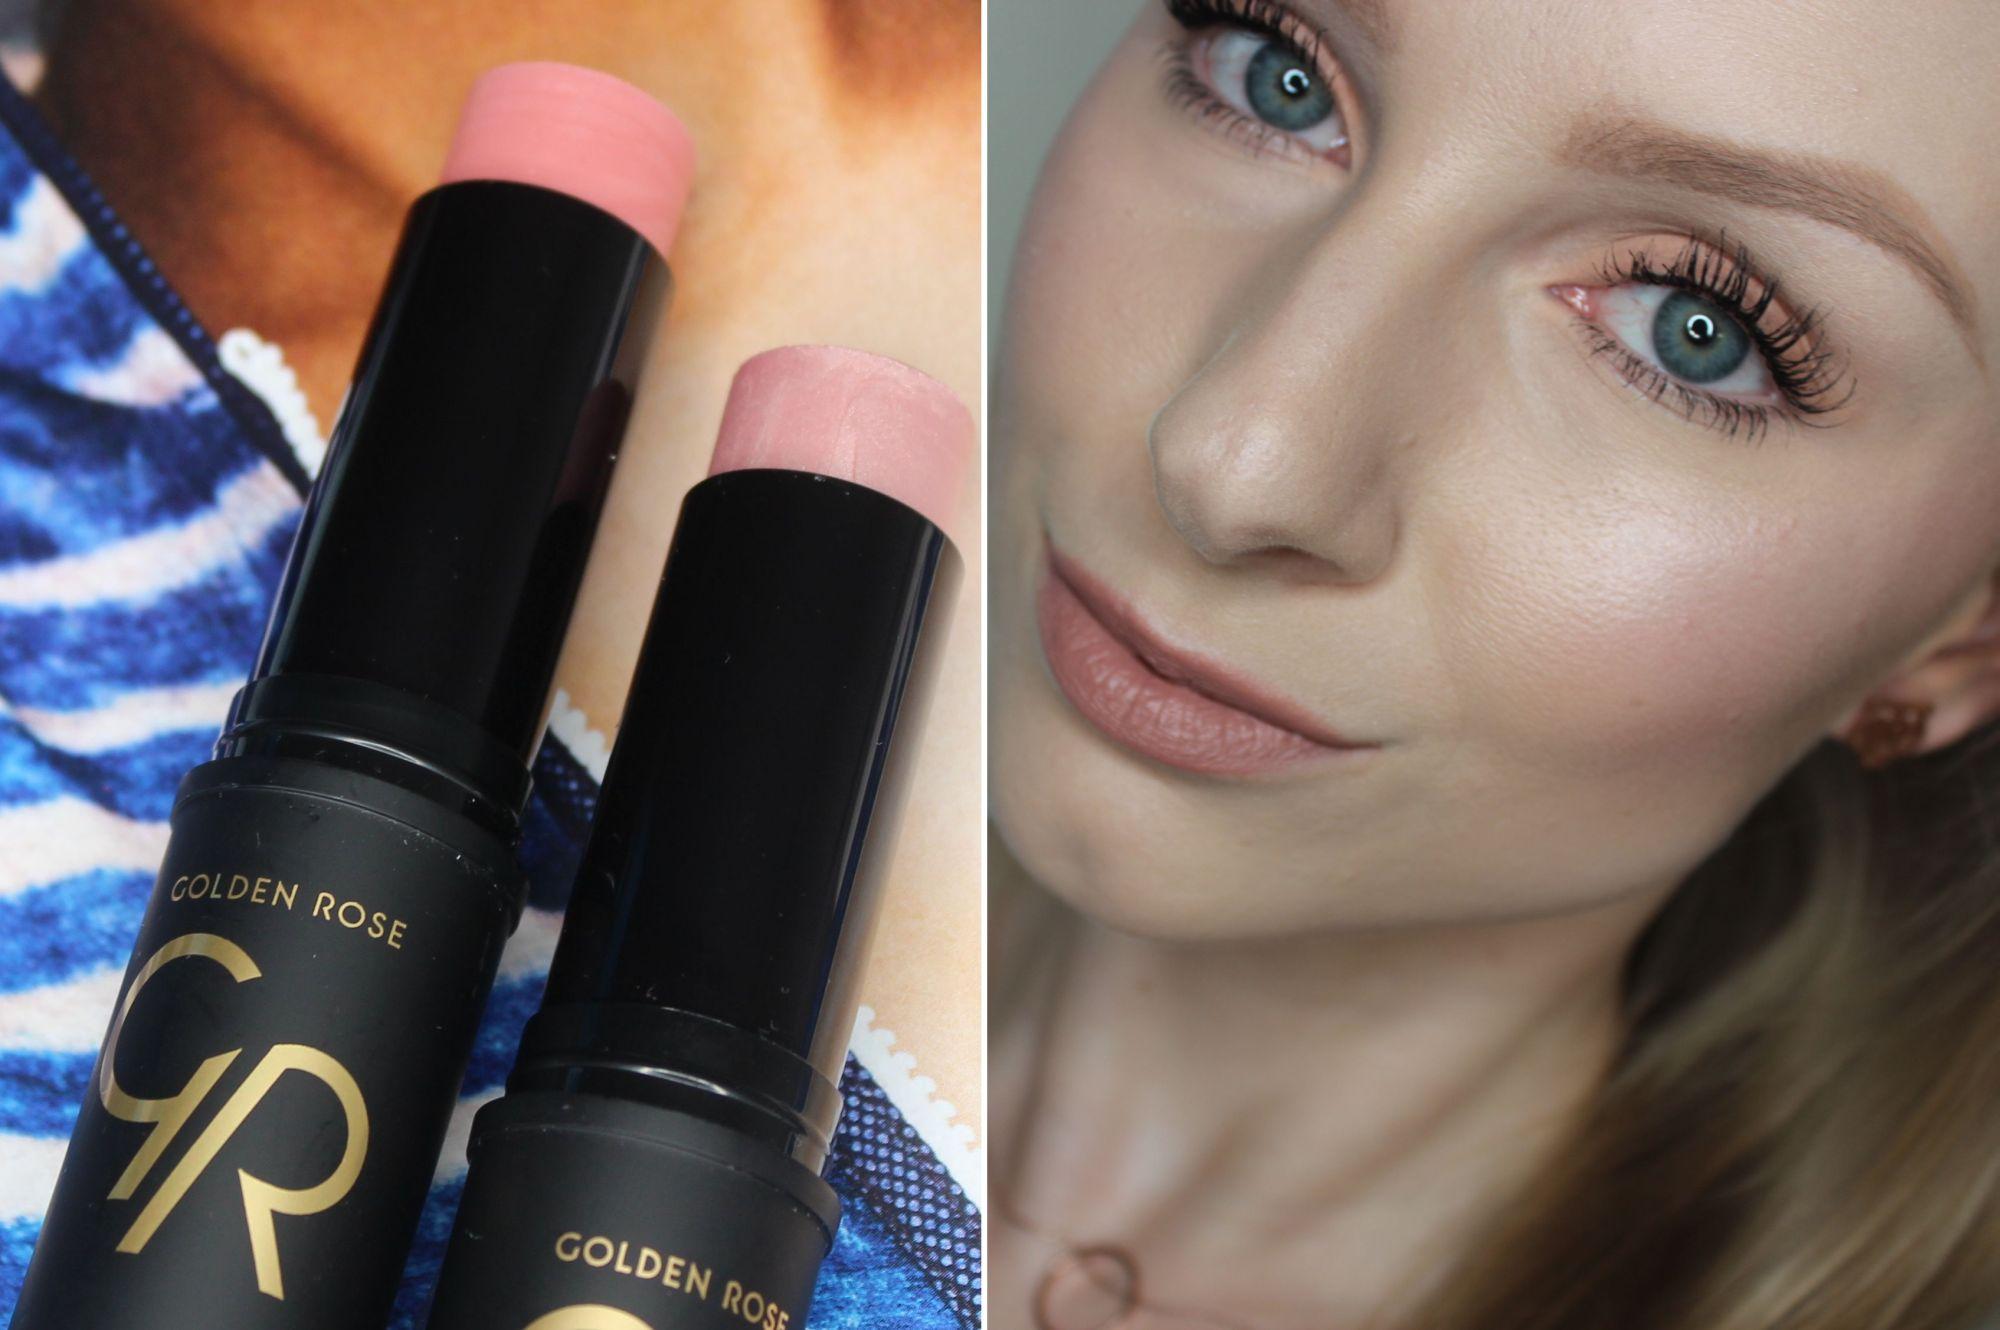 Golden Rose Creamy Blush & Highlighter Stick 4